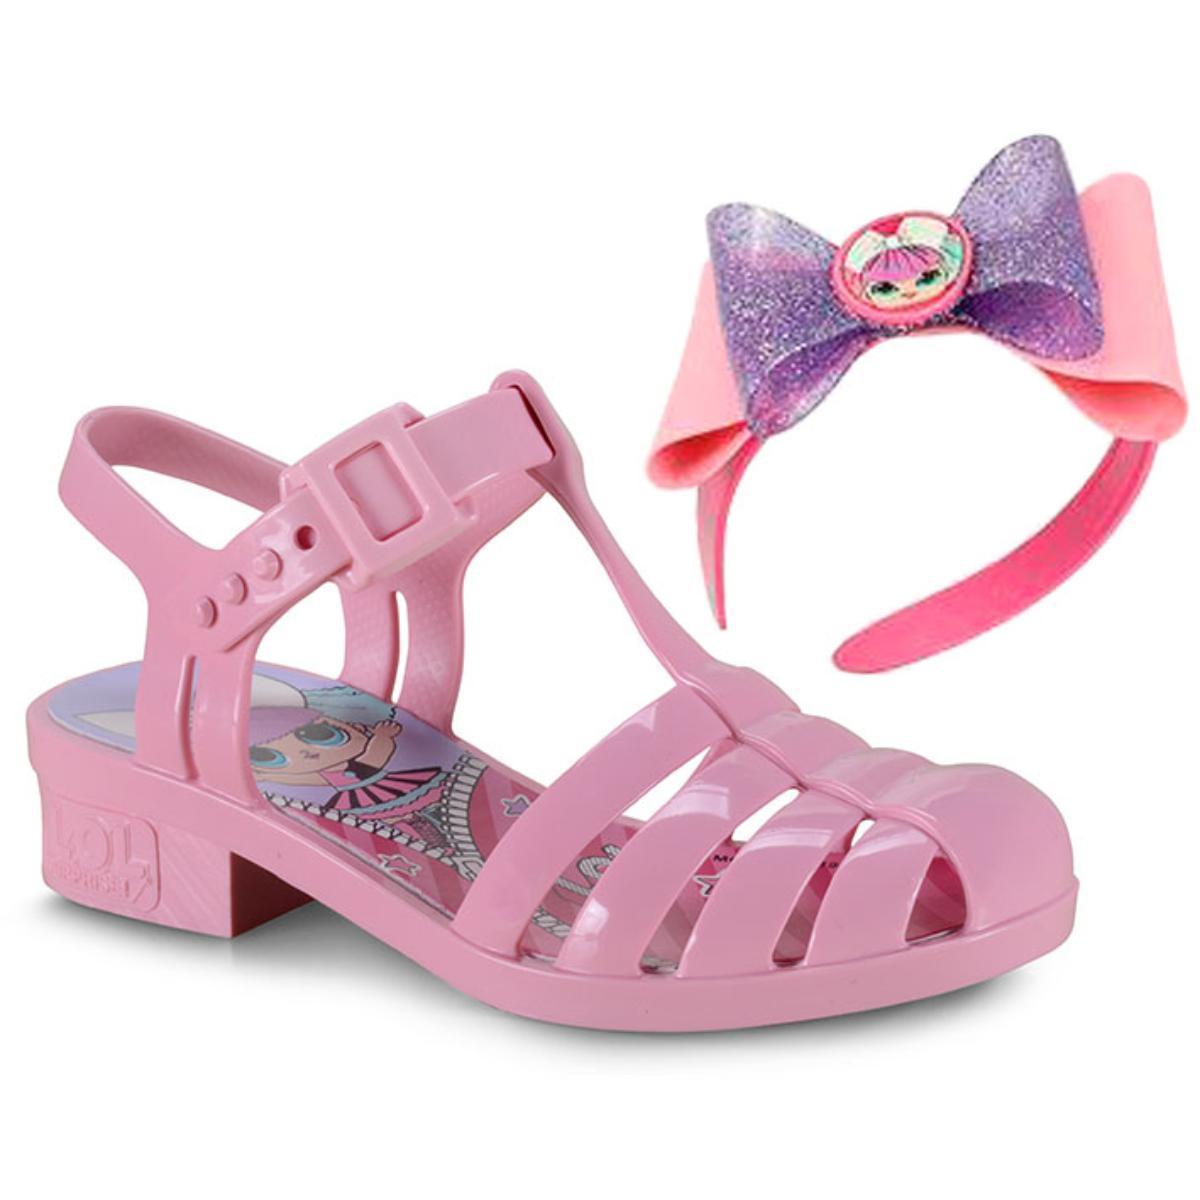 Sandália Fem Infantil Grendene 22004 52898 Lol Laço Mania Rosa/rosa Claro